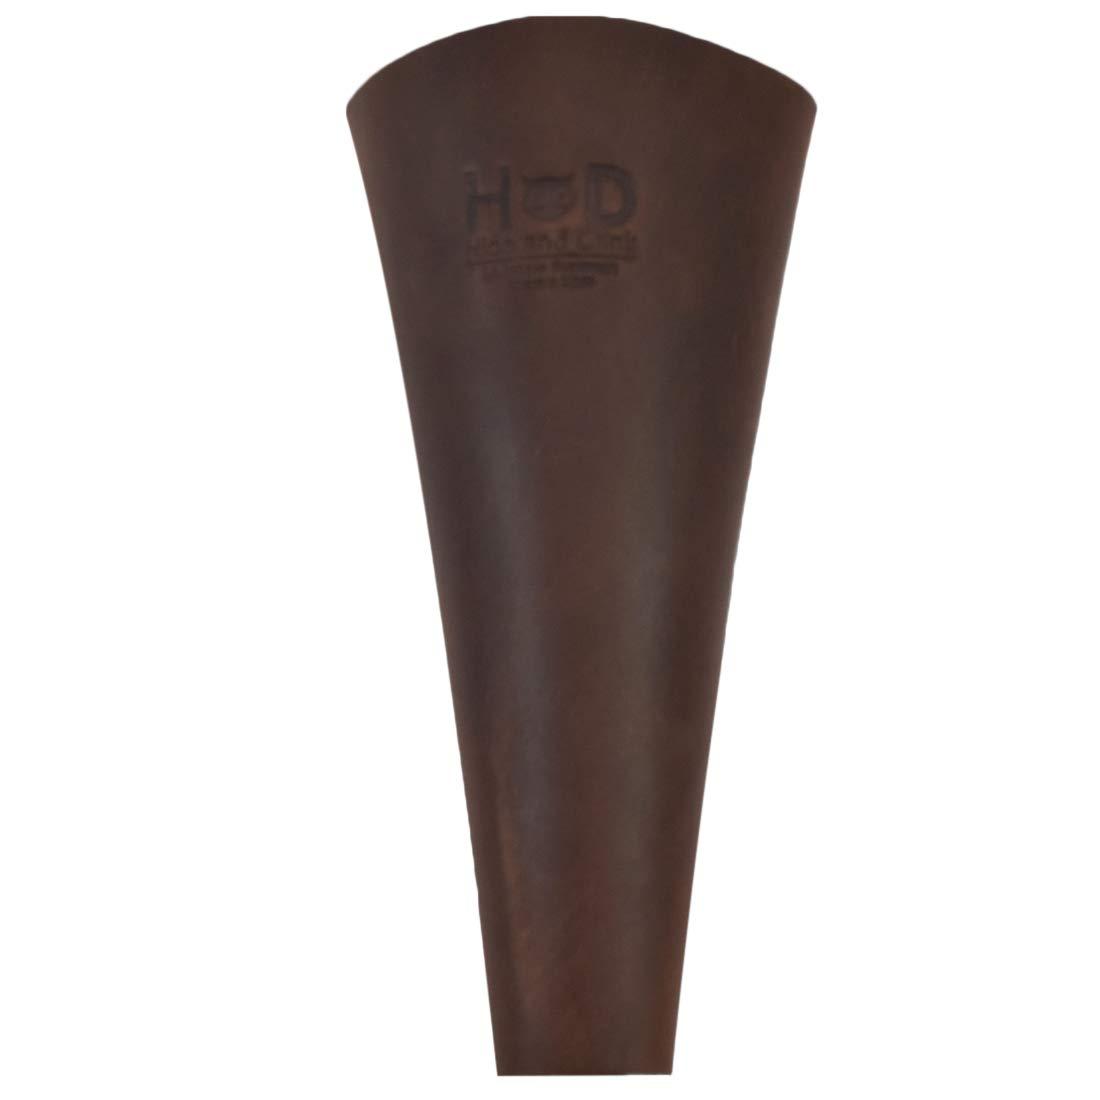 Hide & Drink, Thick Leather Scabbard Belt Loop Holster/Blade & Pruner Sheath Handmade Includes 101 Year Warranty :: Bourbon Brown